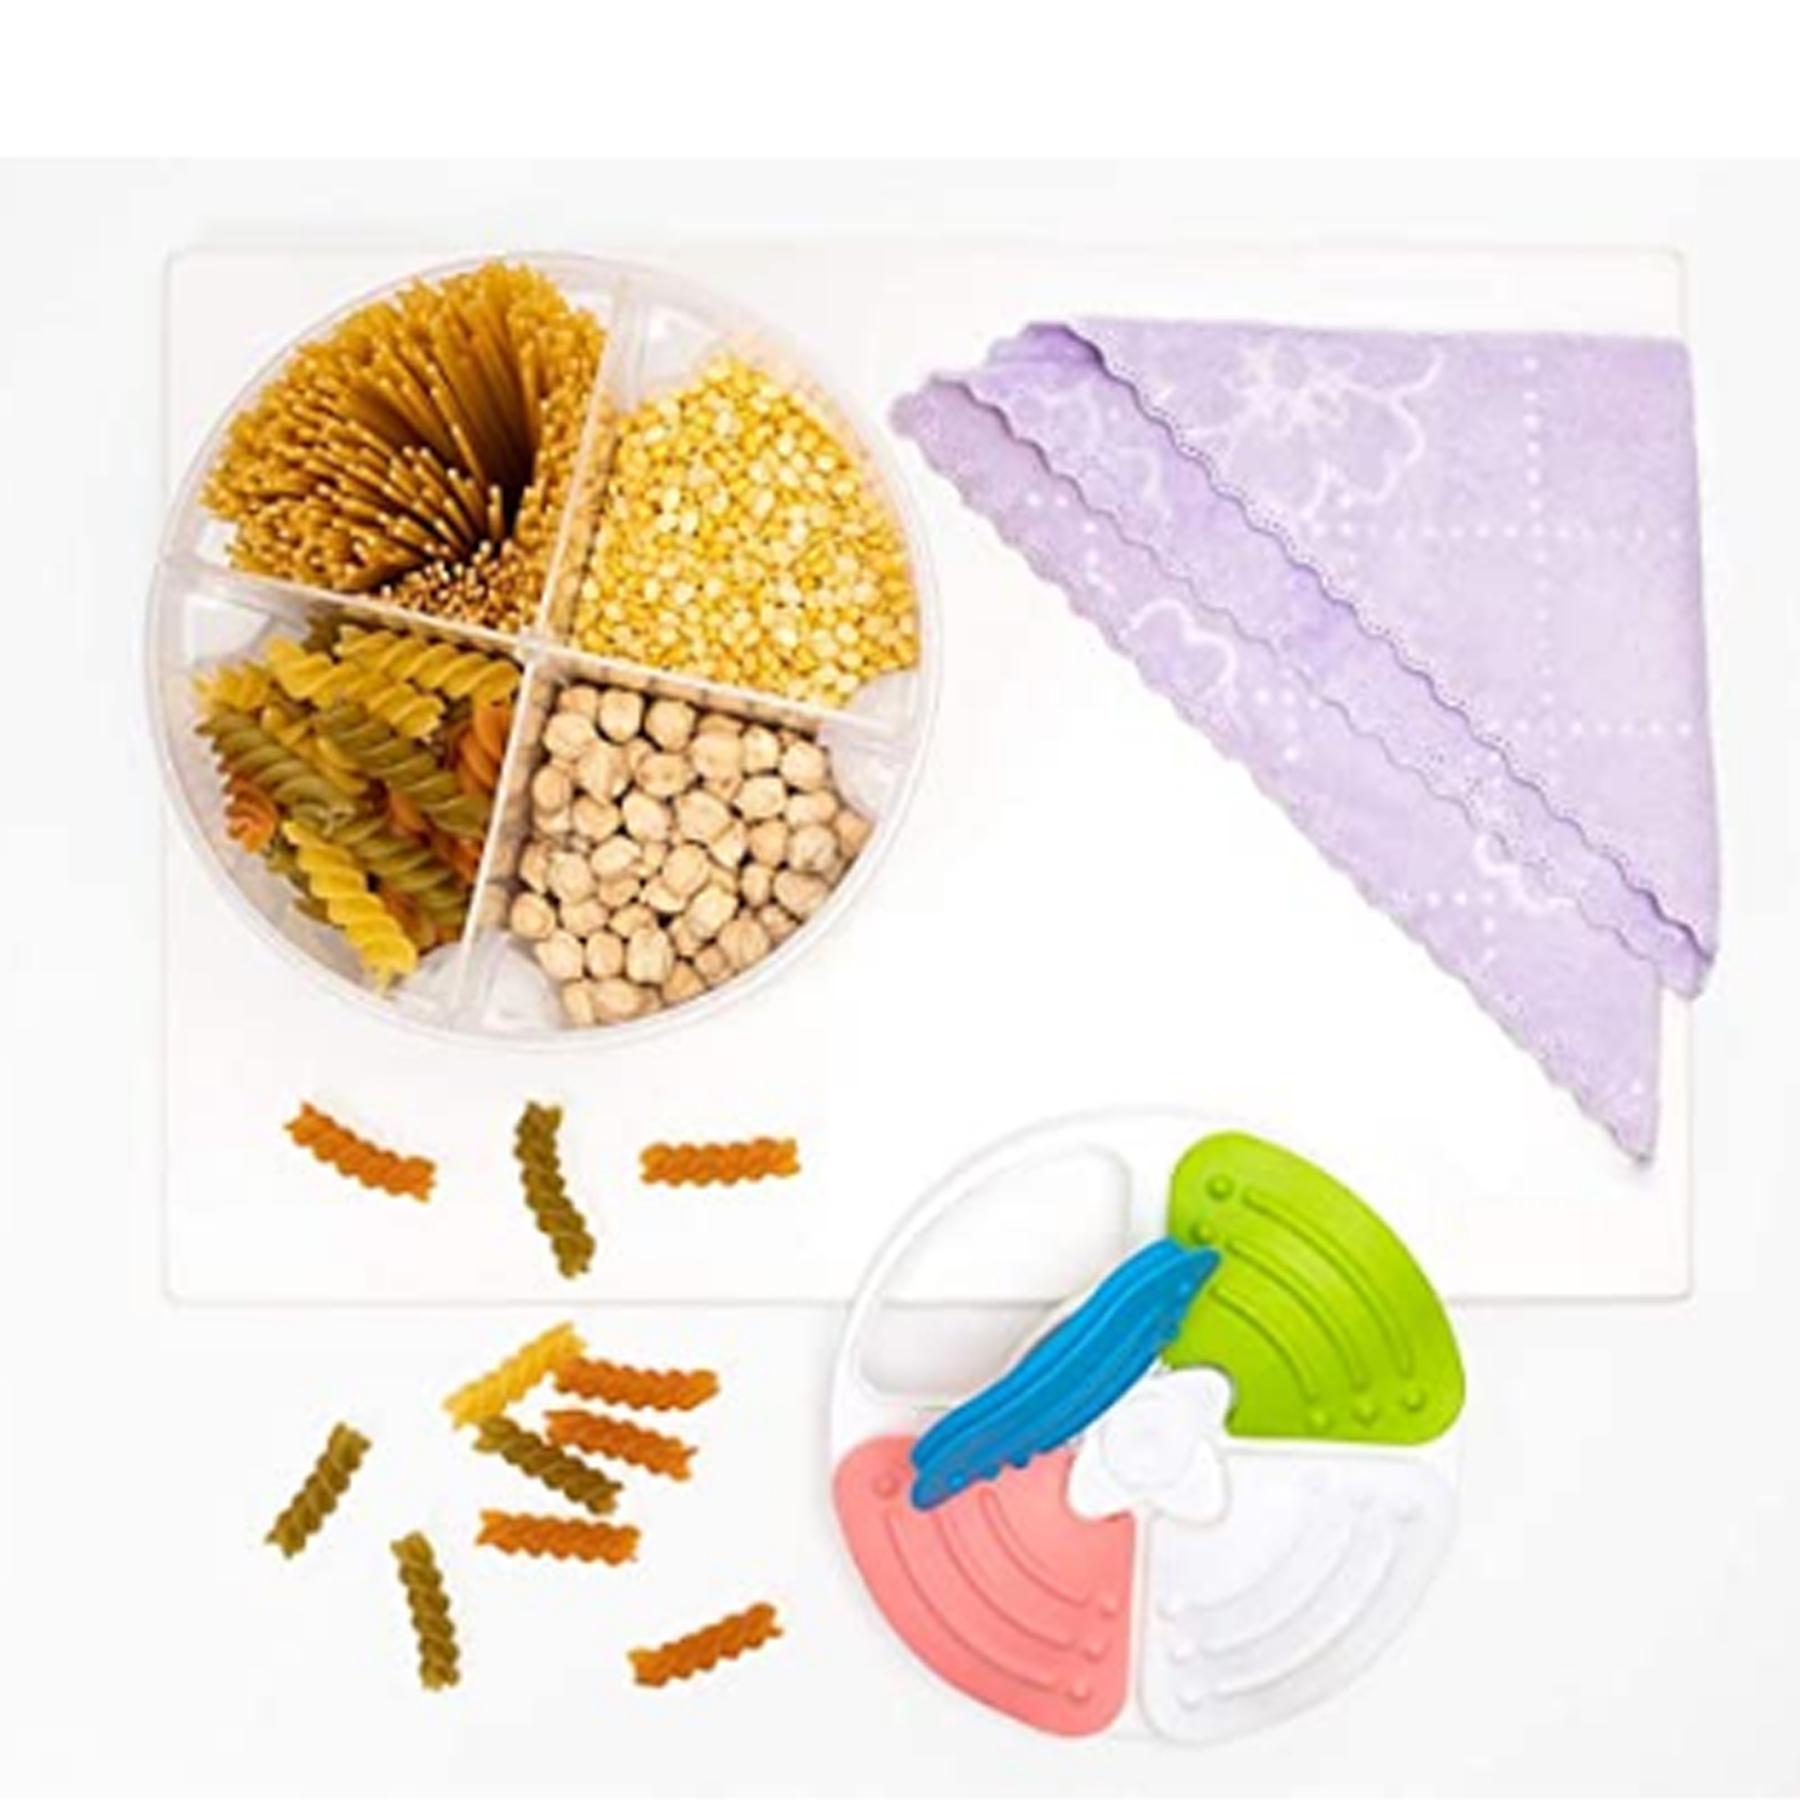 Air Tight Plastic Food Storage Container